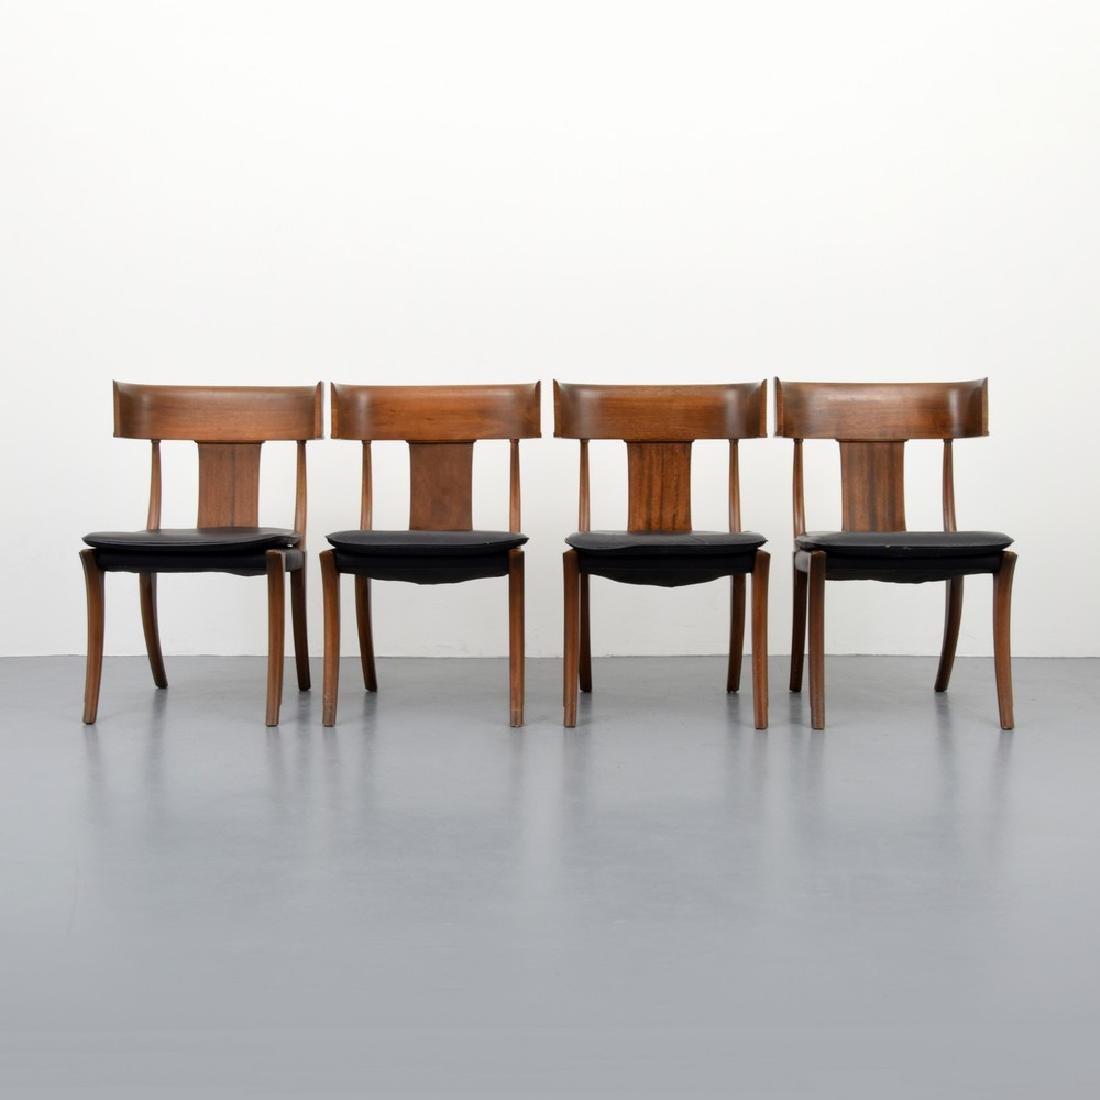 "Stewart & MacDougall ""Klismos"" Dining Chairs, Set of 8 - 2"